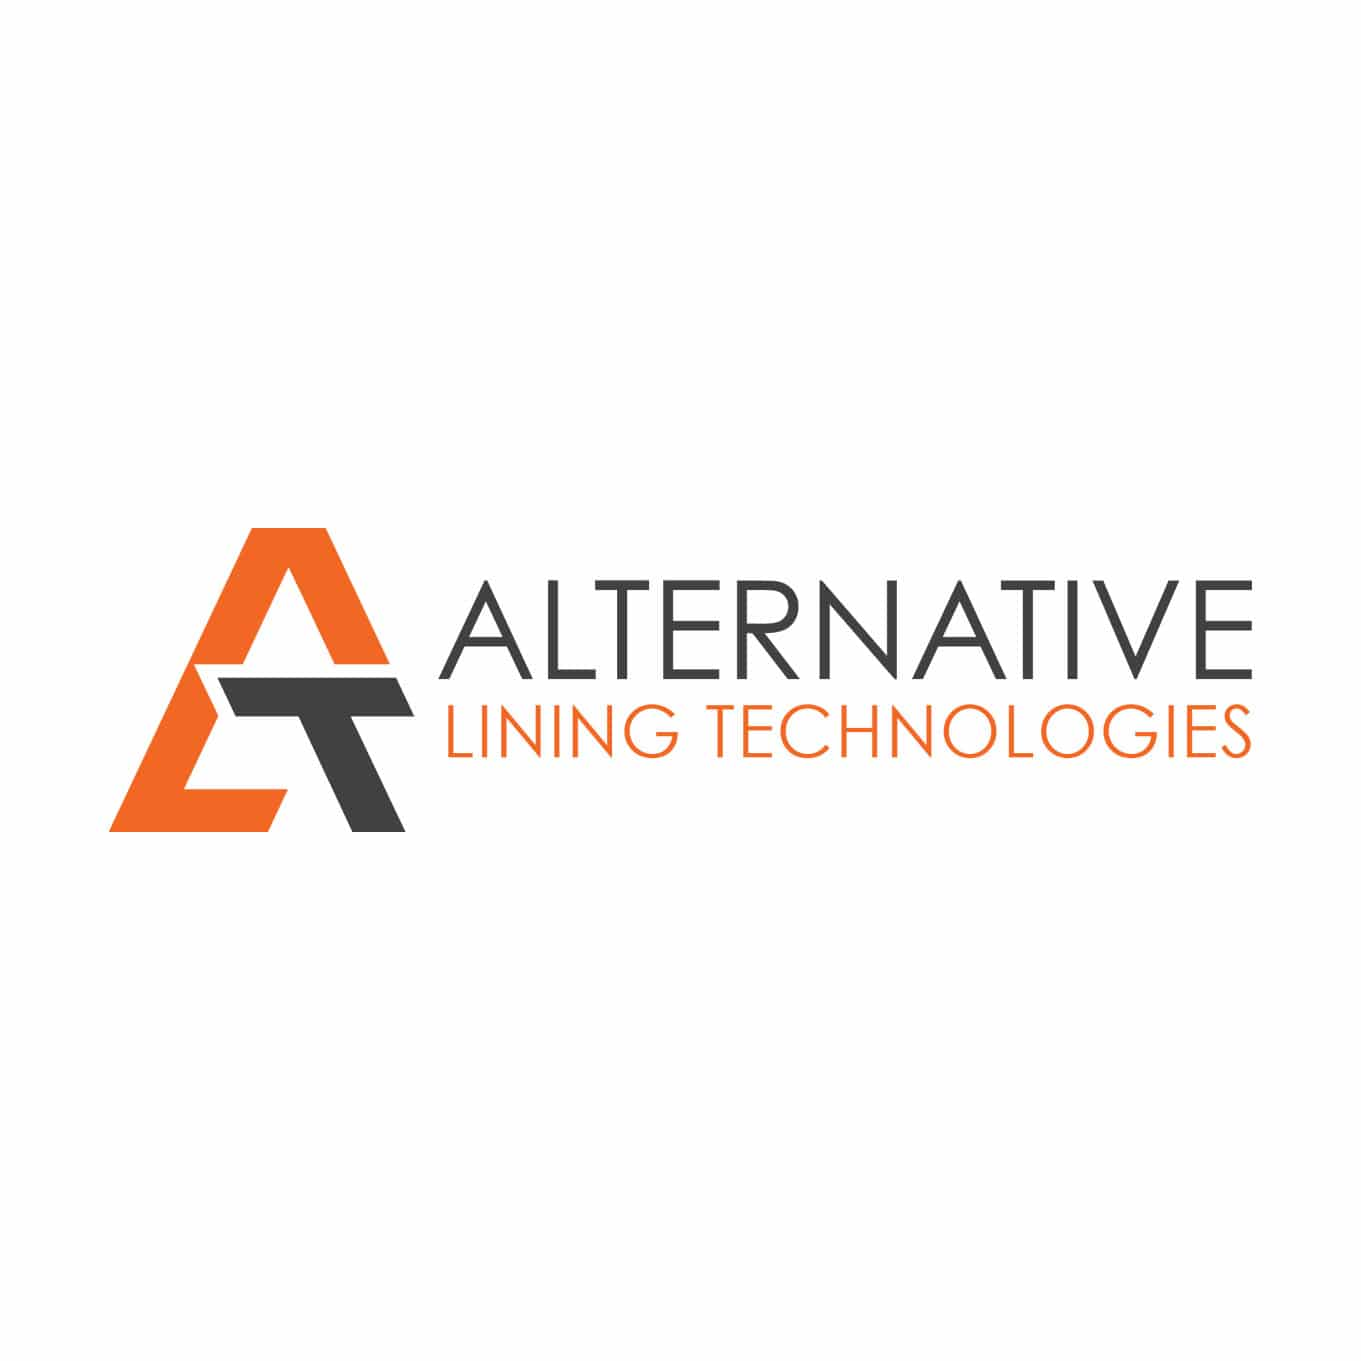 alternative-lining-technologies